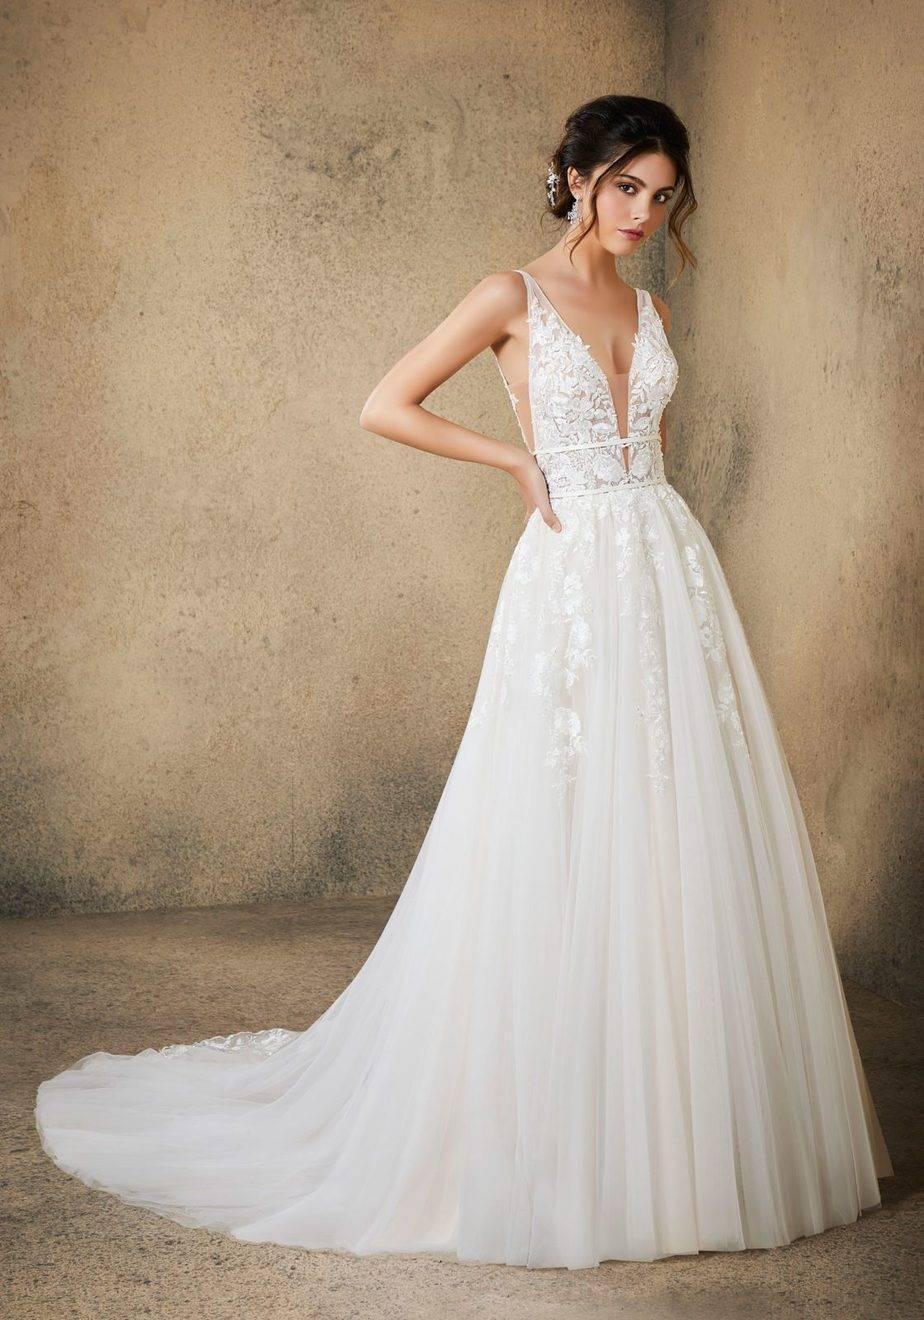 The Ultimate Guide To Mori Lee Wedding Dresses Wedding Shoppe,Designer Plus Size Wedding Guest Dresses